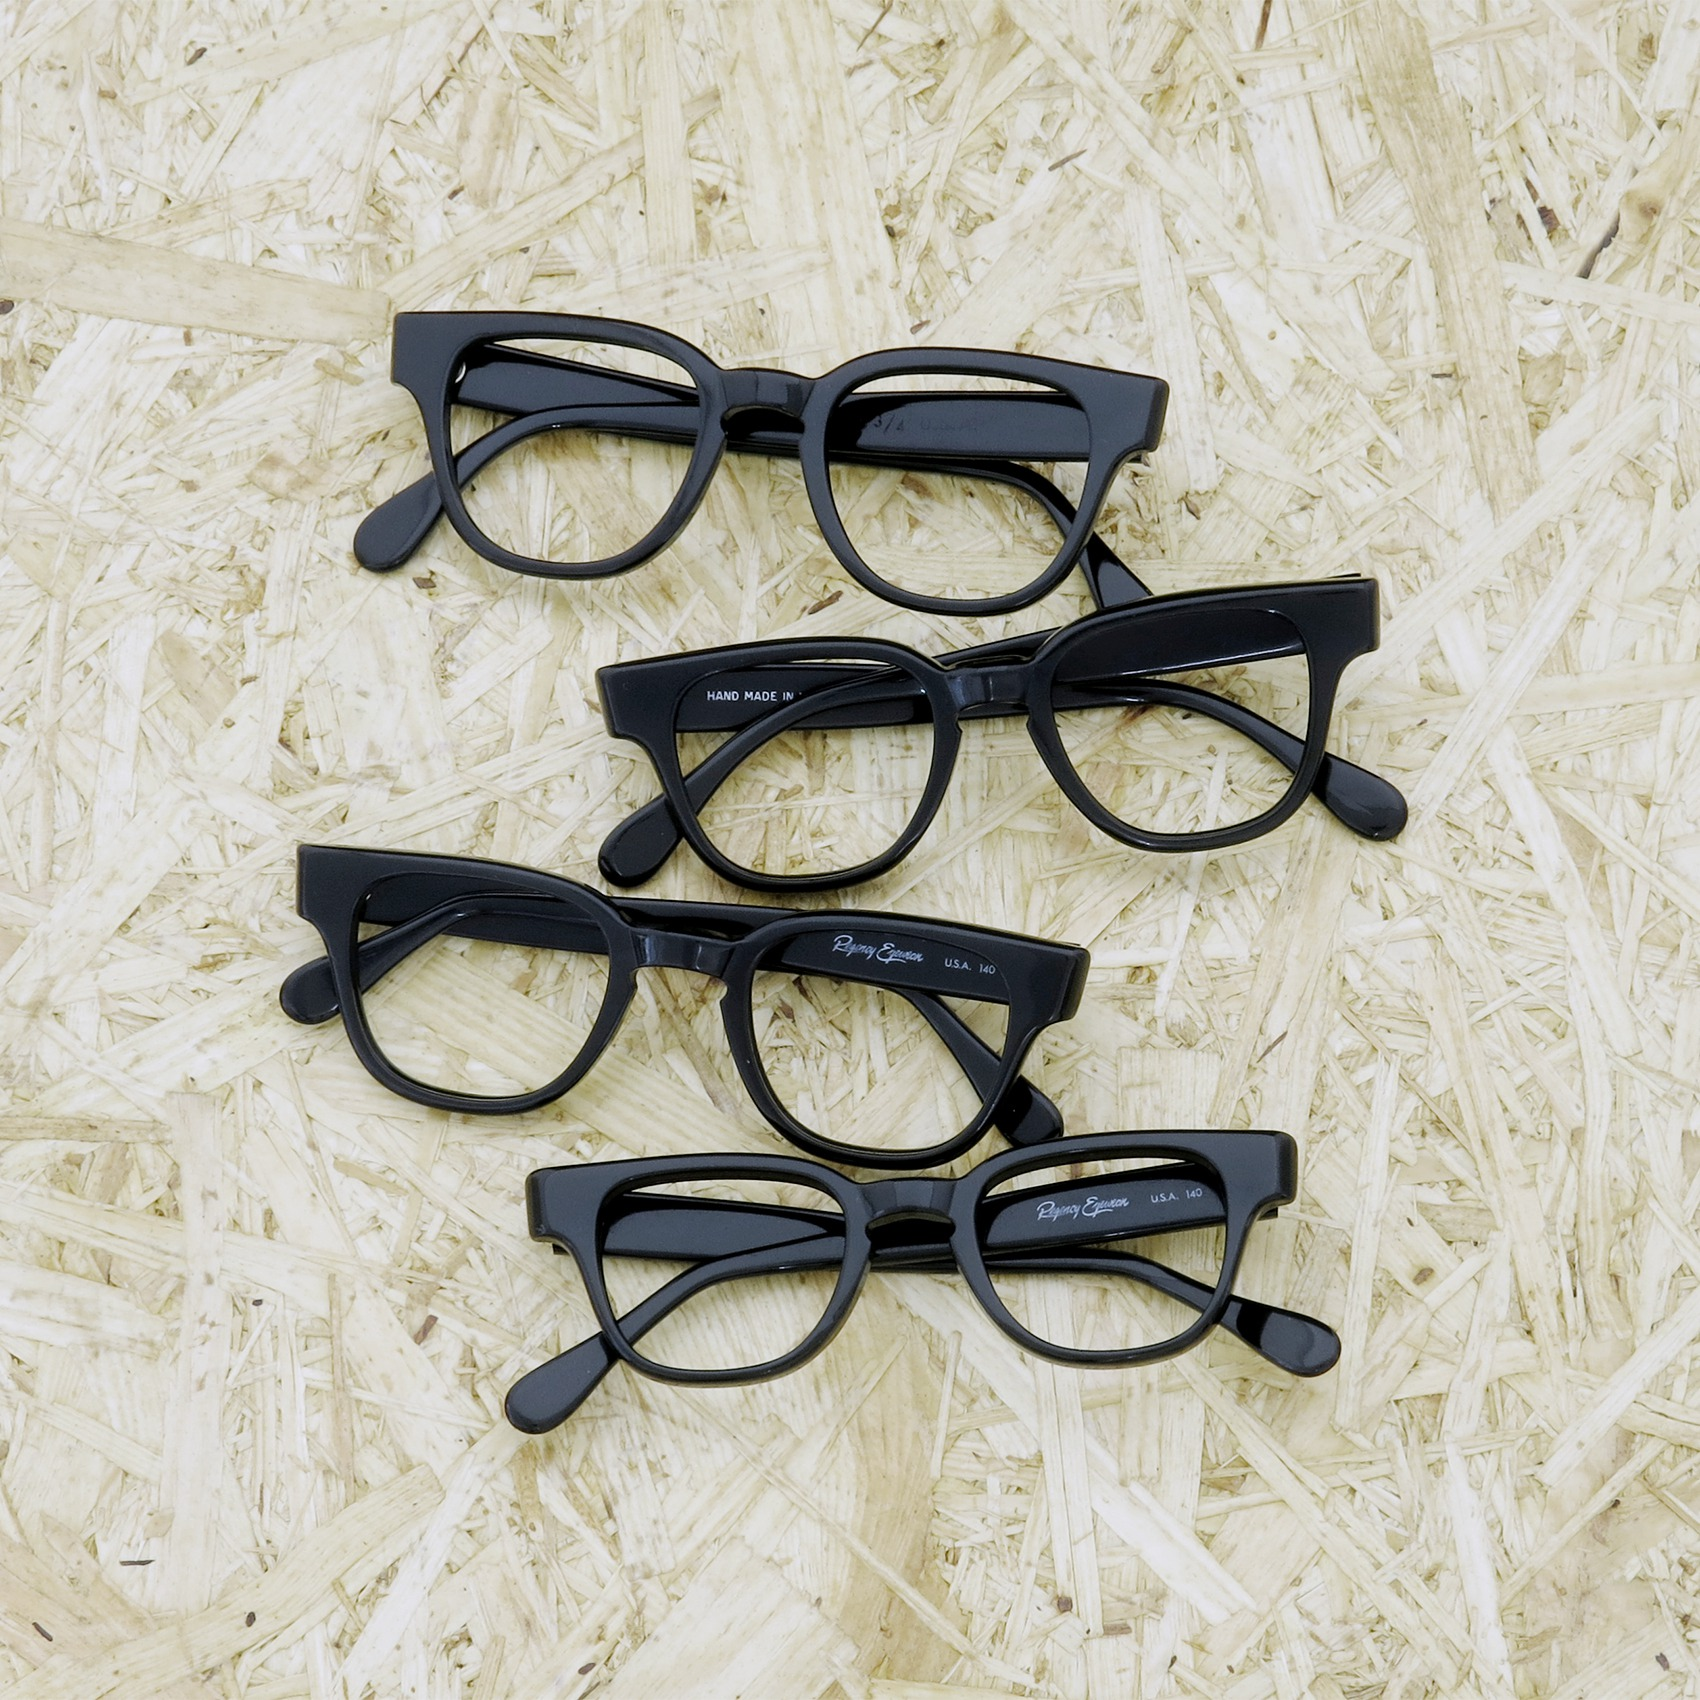 TART OPTICAL / Regency Eyewear bryan